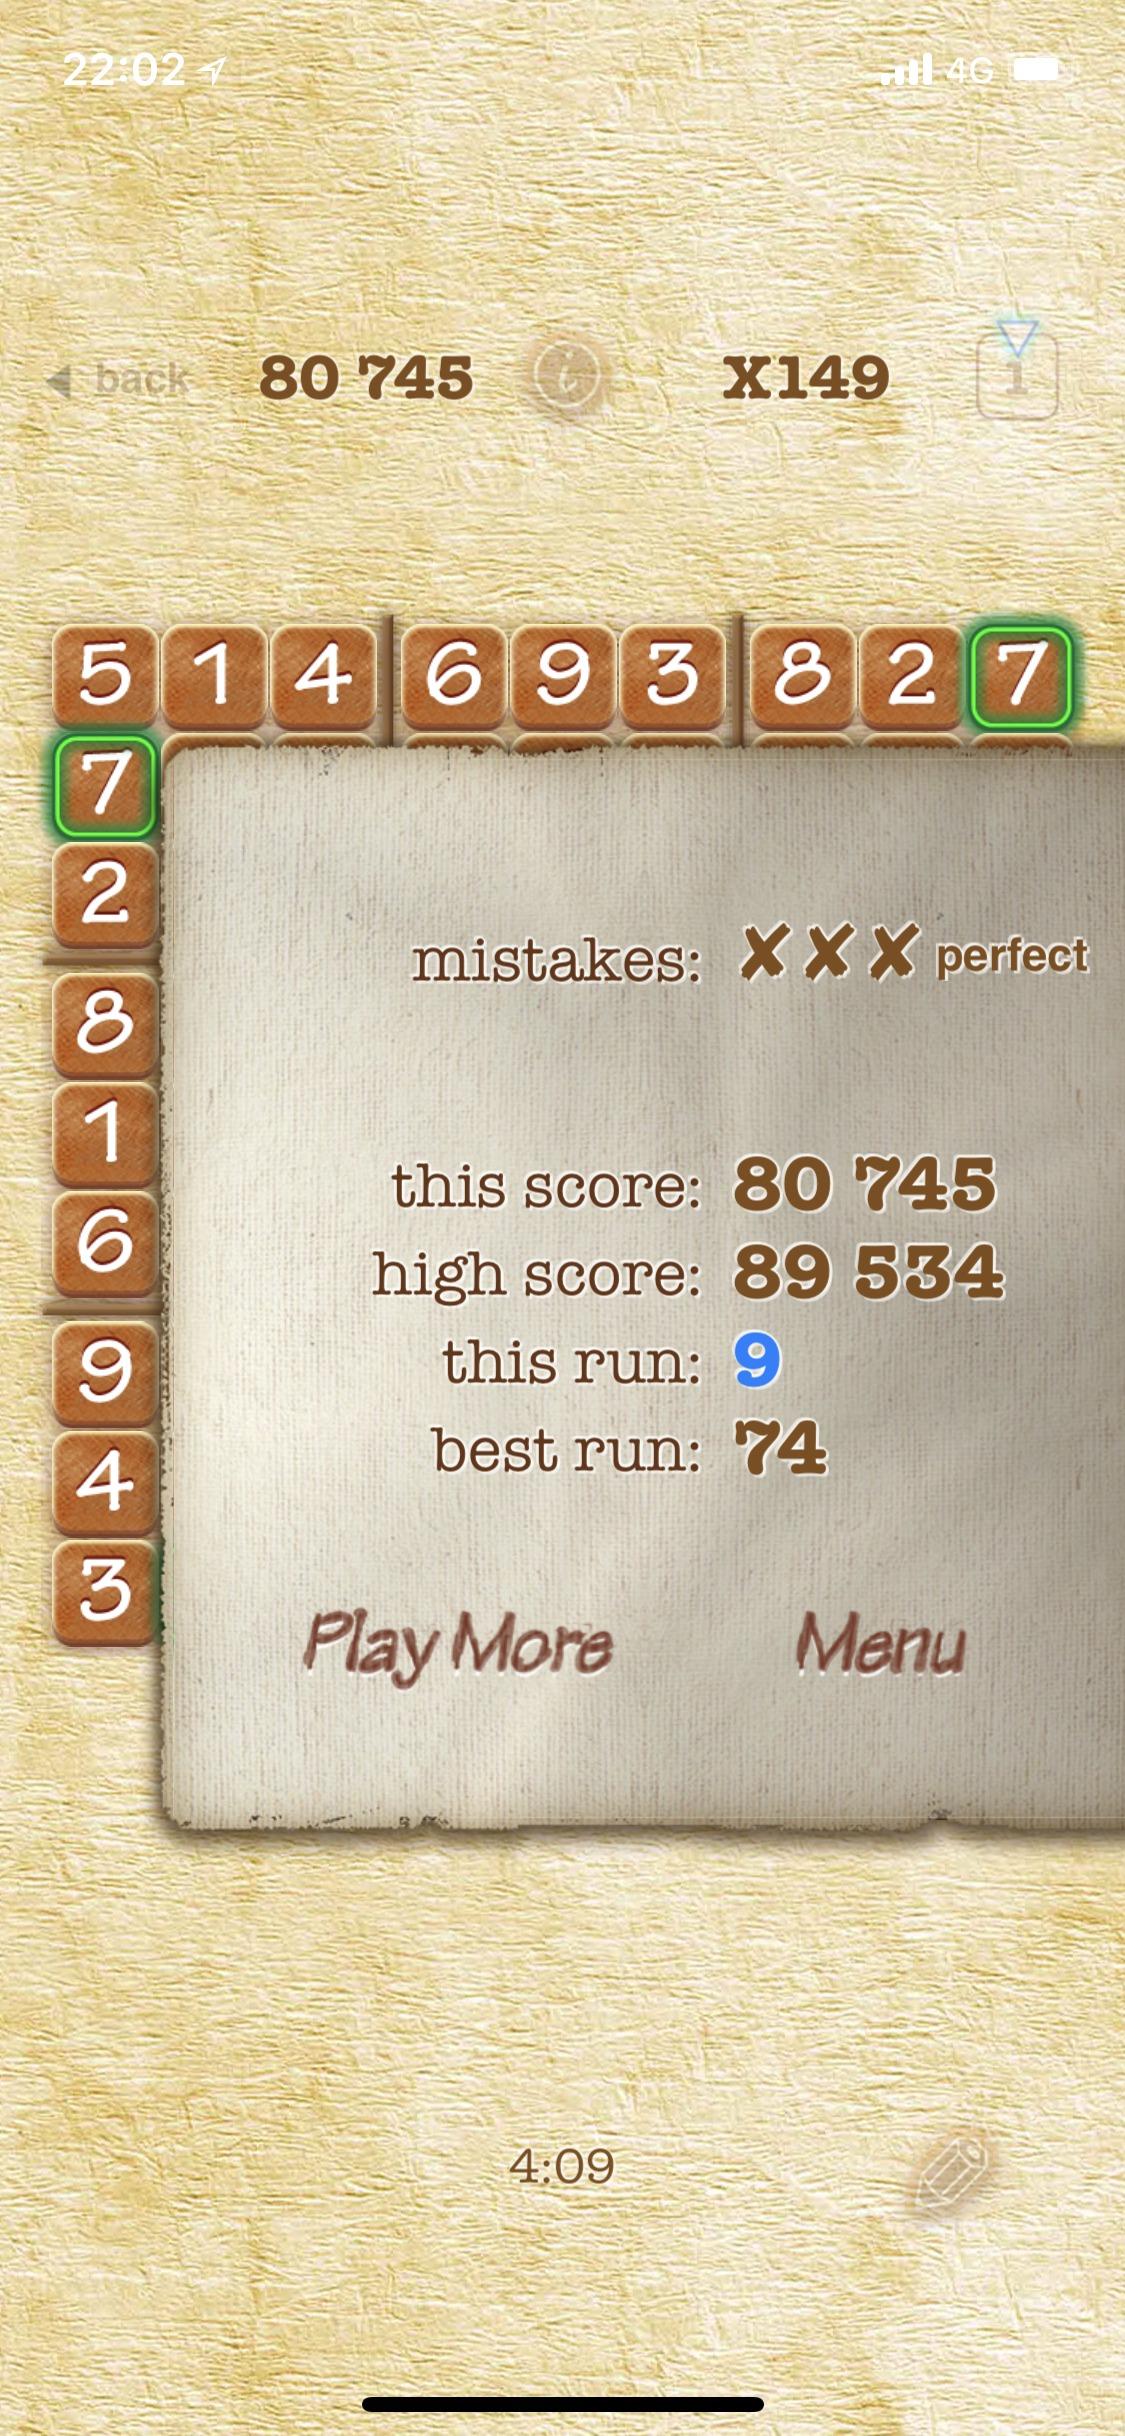 Maxwel: Sudoku 2 Pro [Expert] (iOS) 89,534 points on 2018-09-20 06:47:16